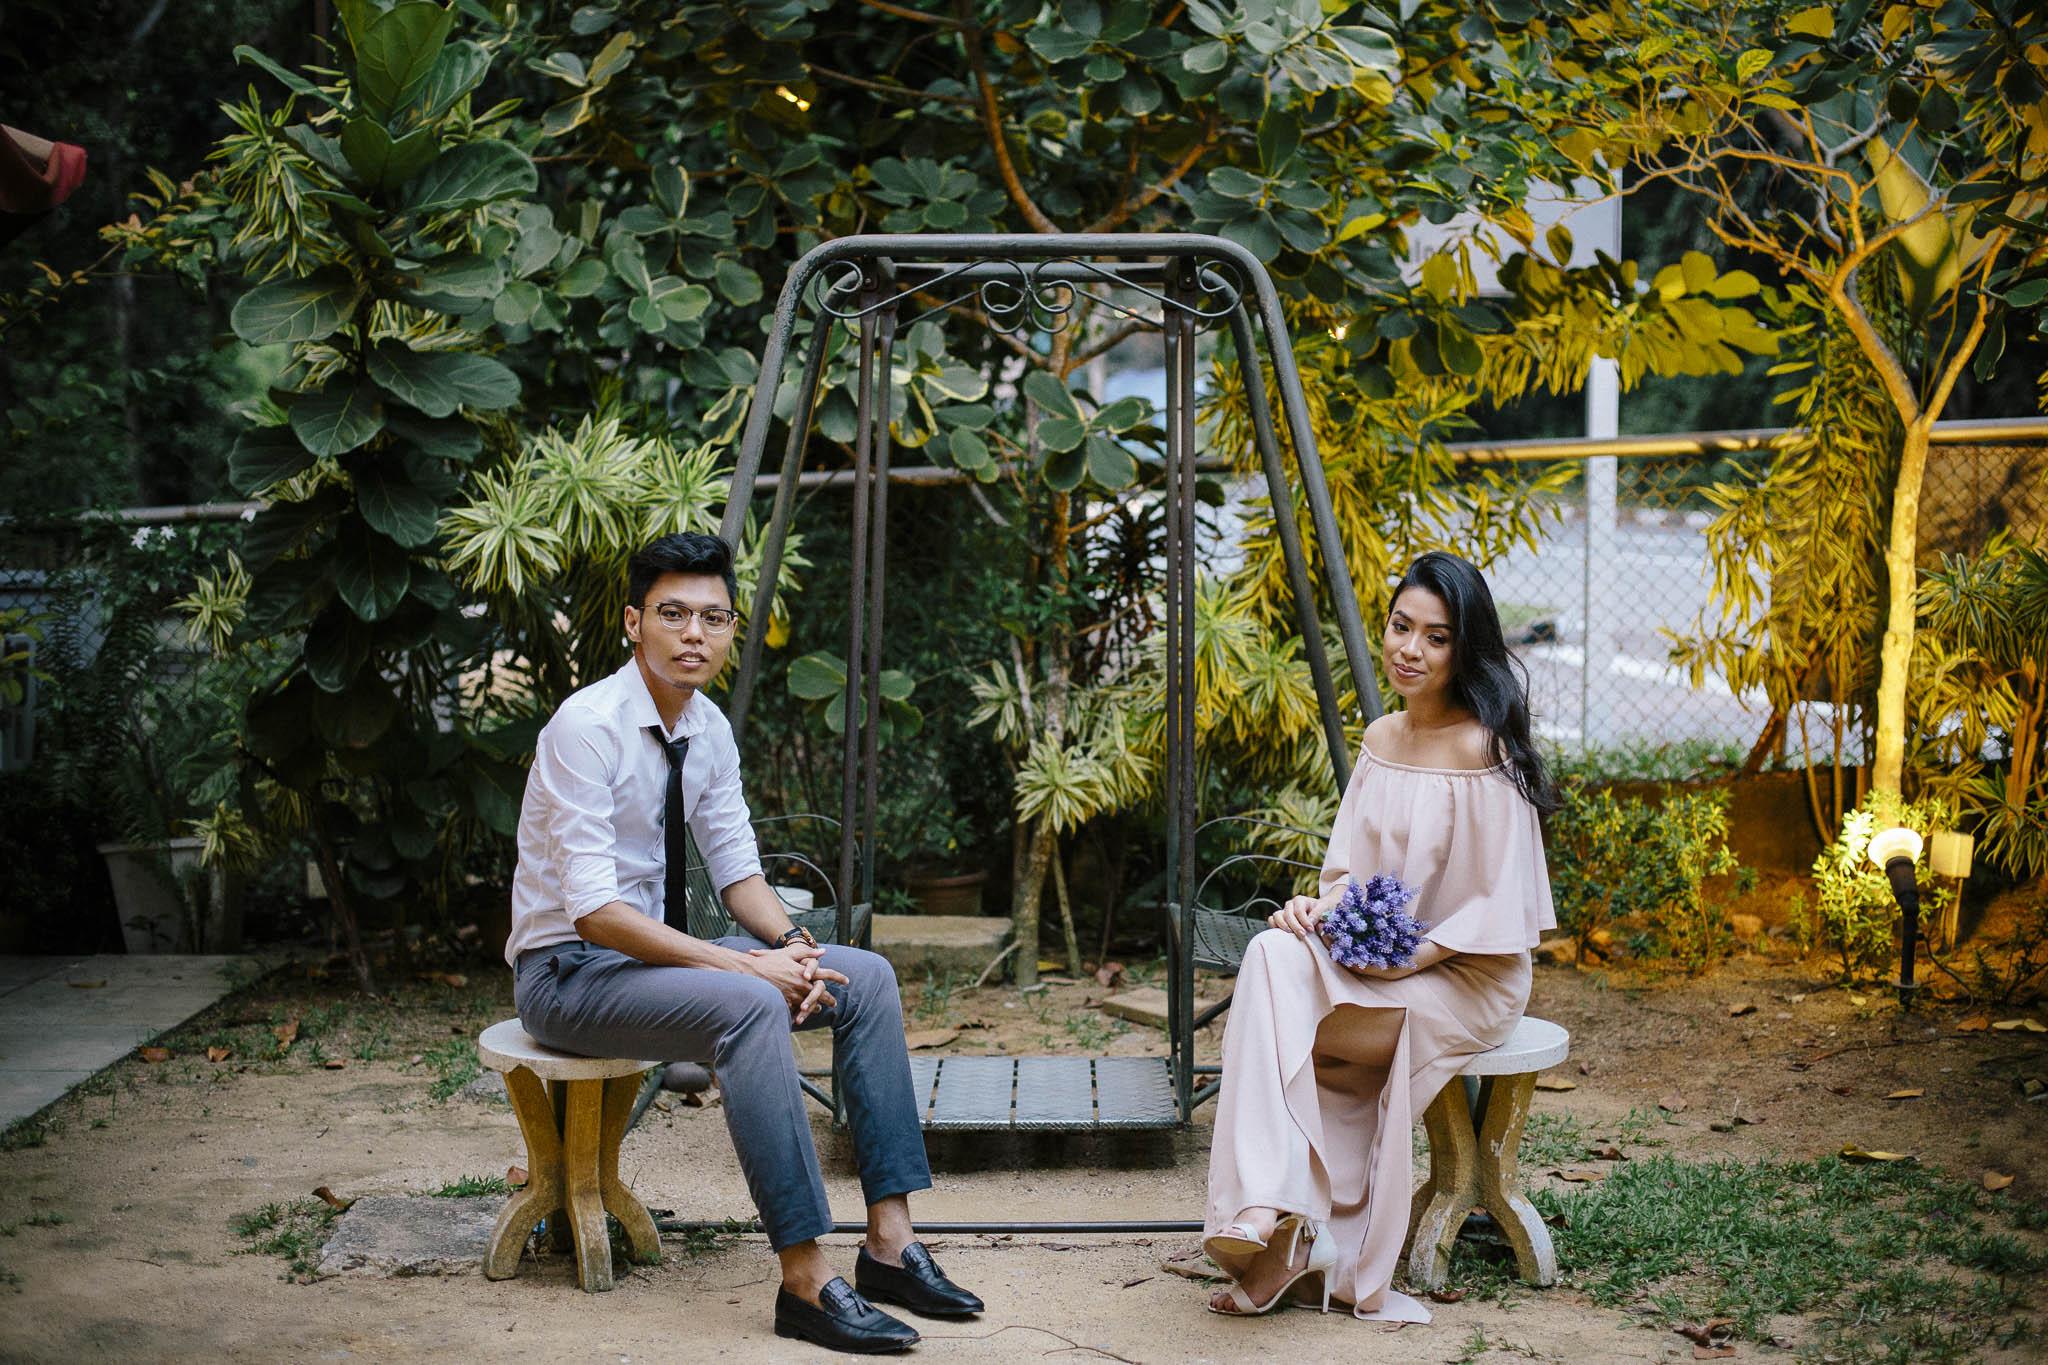 singapore-wedding-photographer-malay-travel-adli-tashah-43.jpg